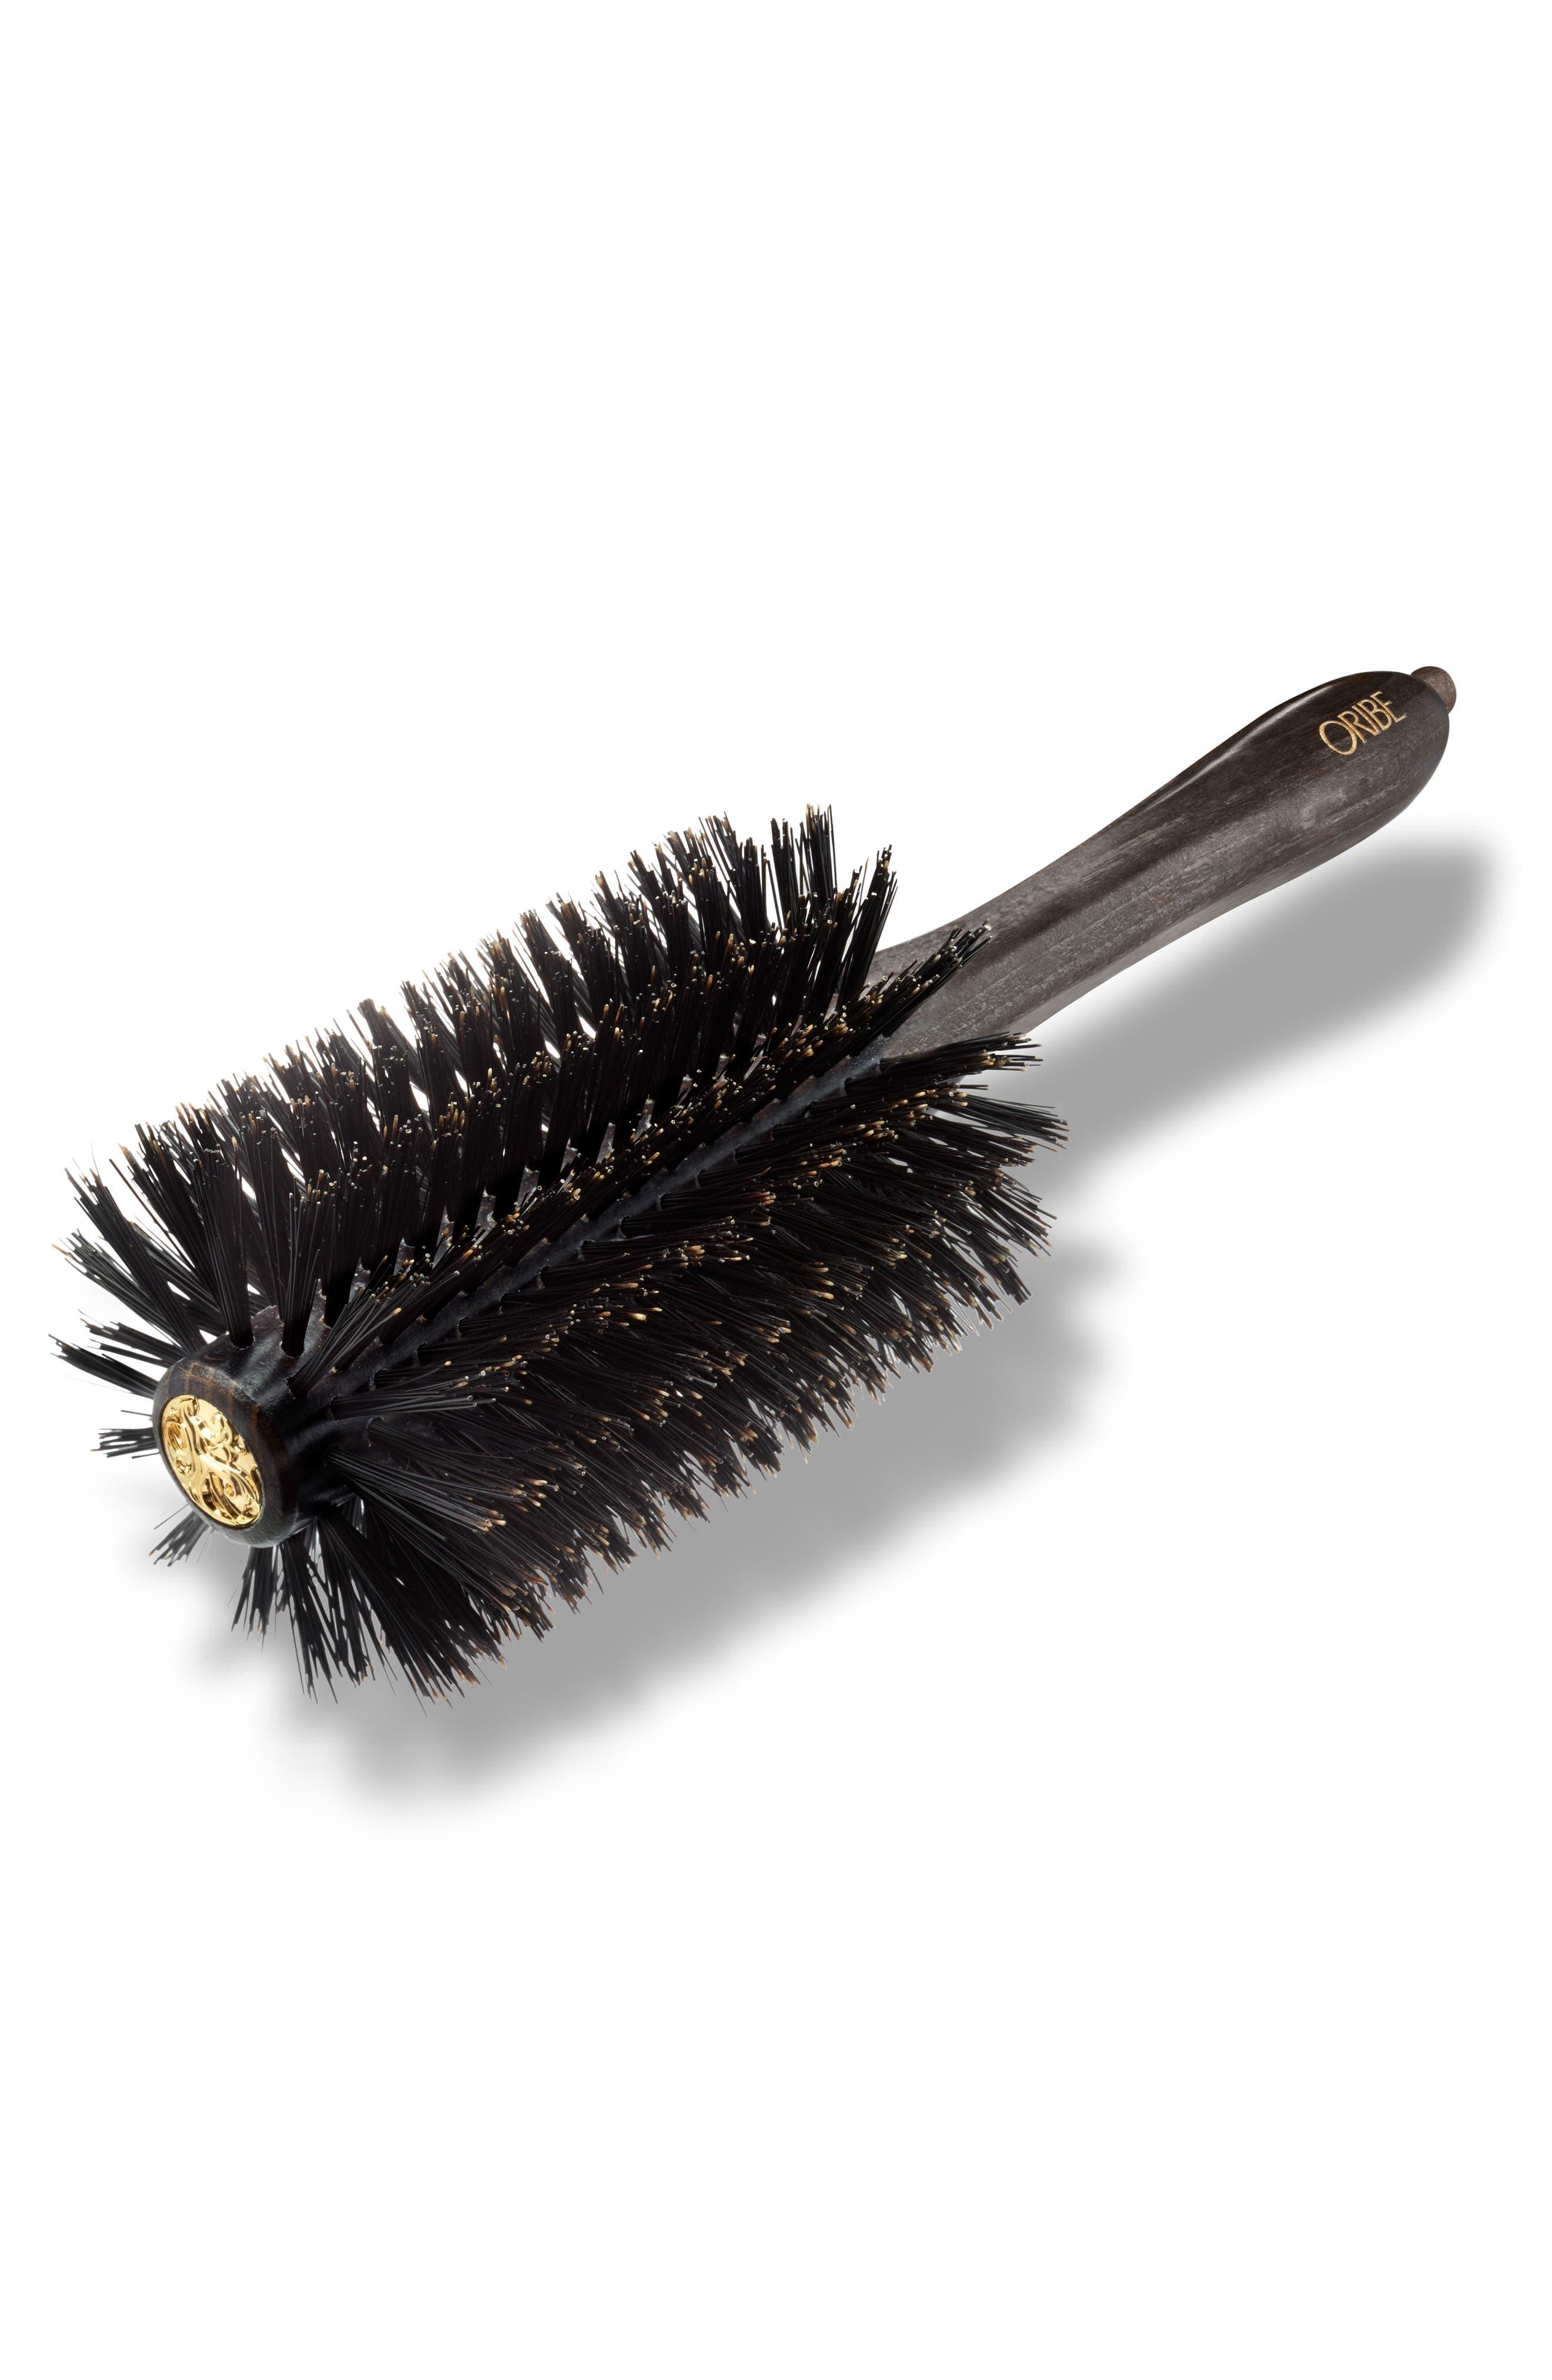 Alternate Image 3  - SPACE.NK.apothecary Oribe Round Bristle Brush